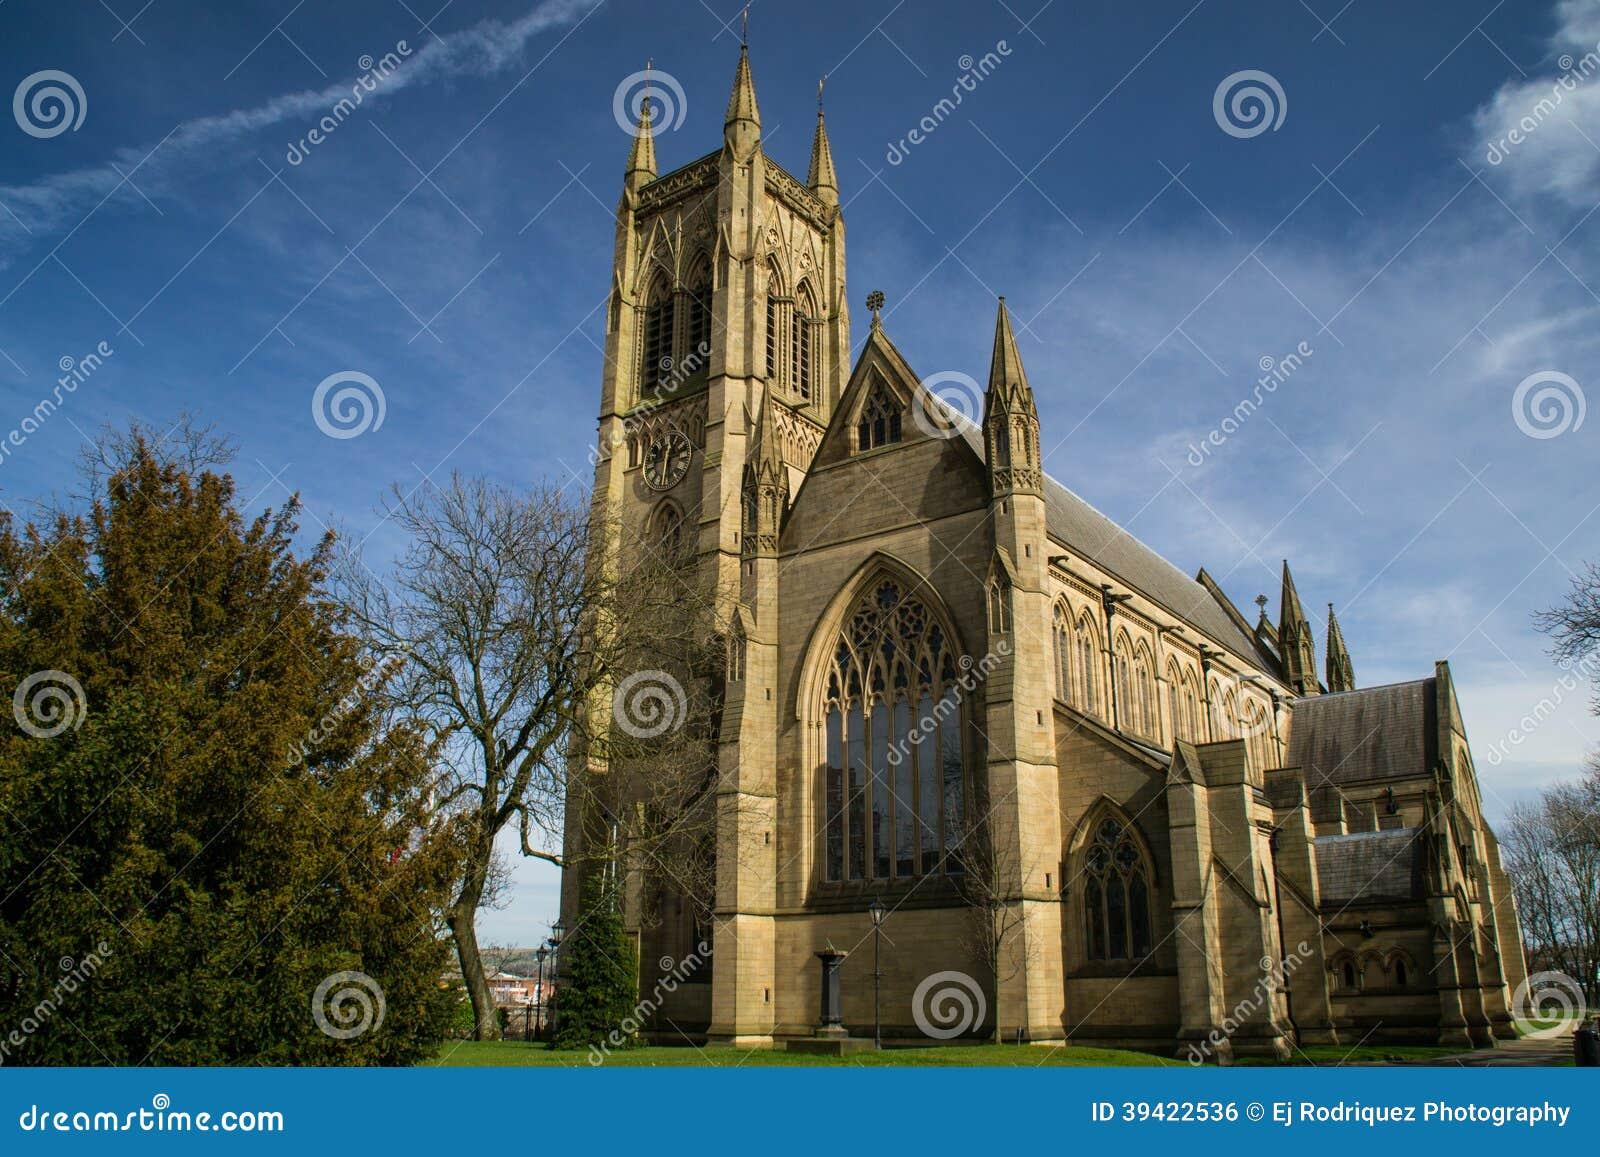 Old English church.